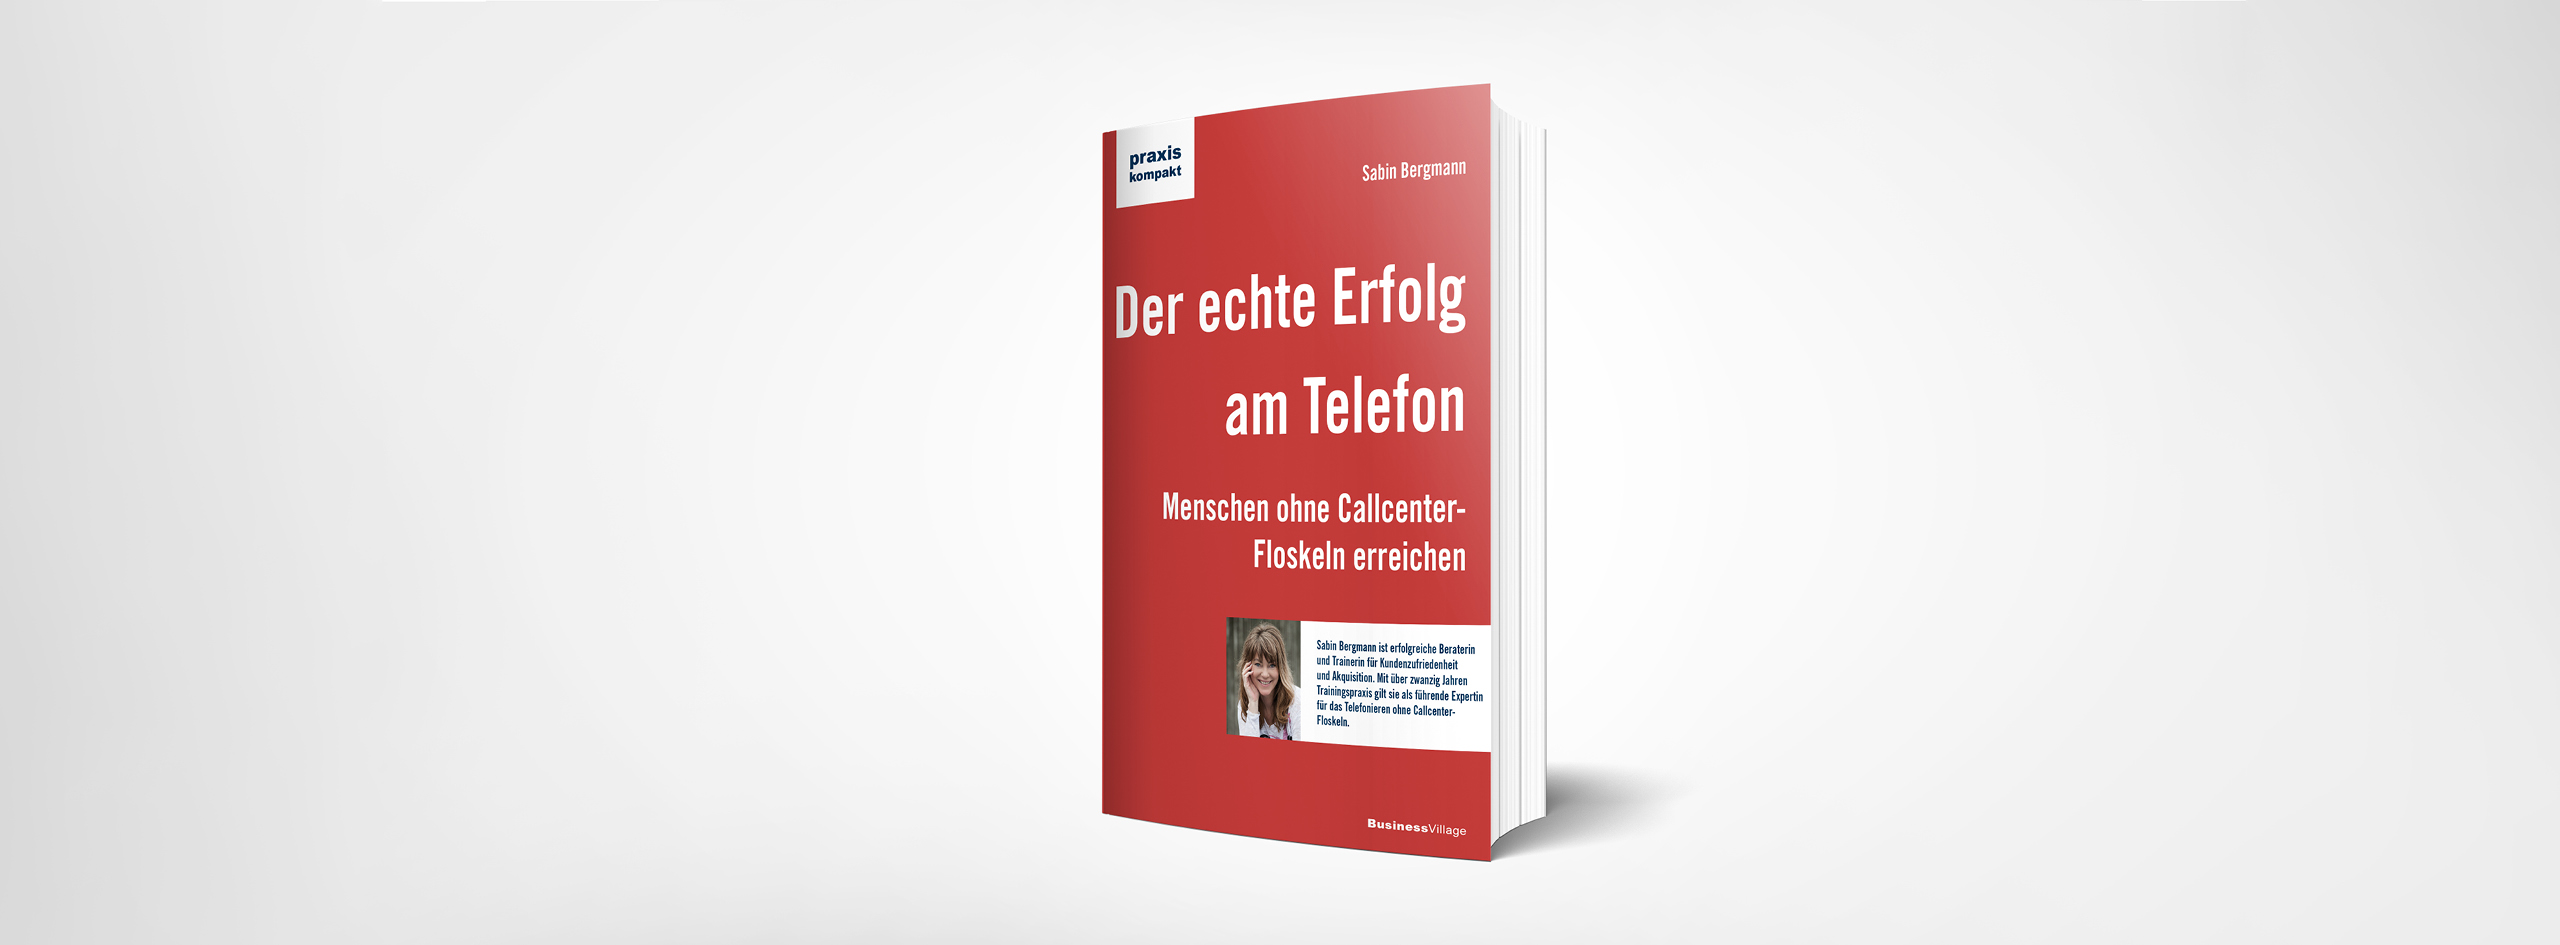 Buch Erfolg am Telefon Sabin Bergmann